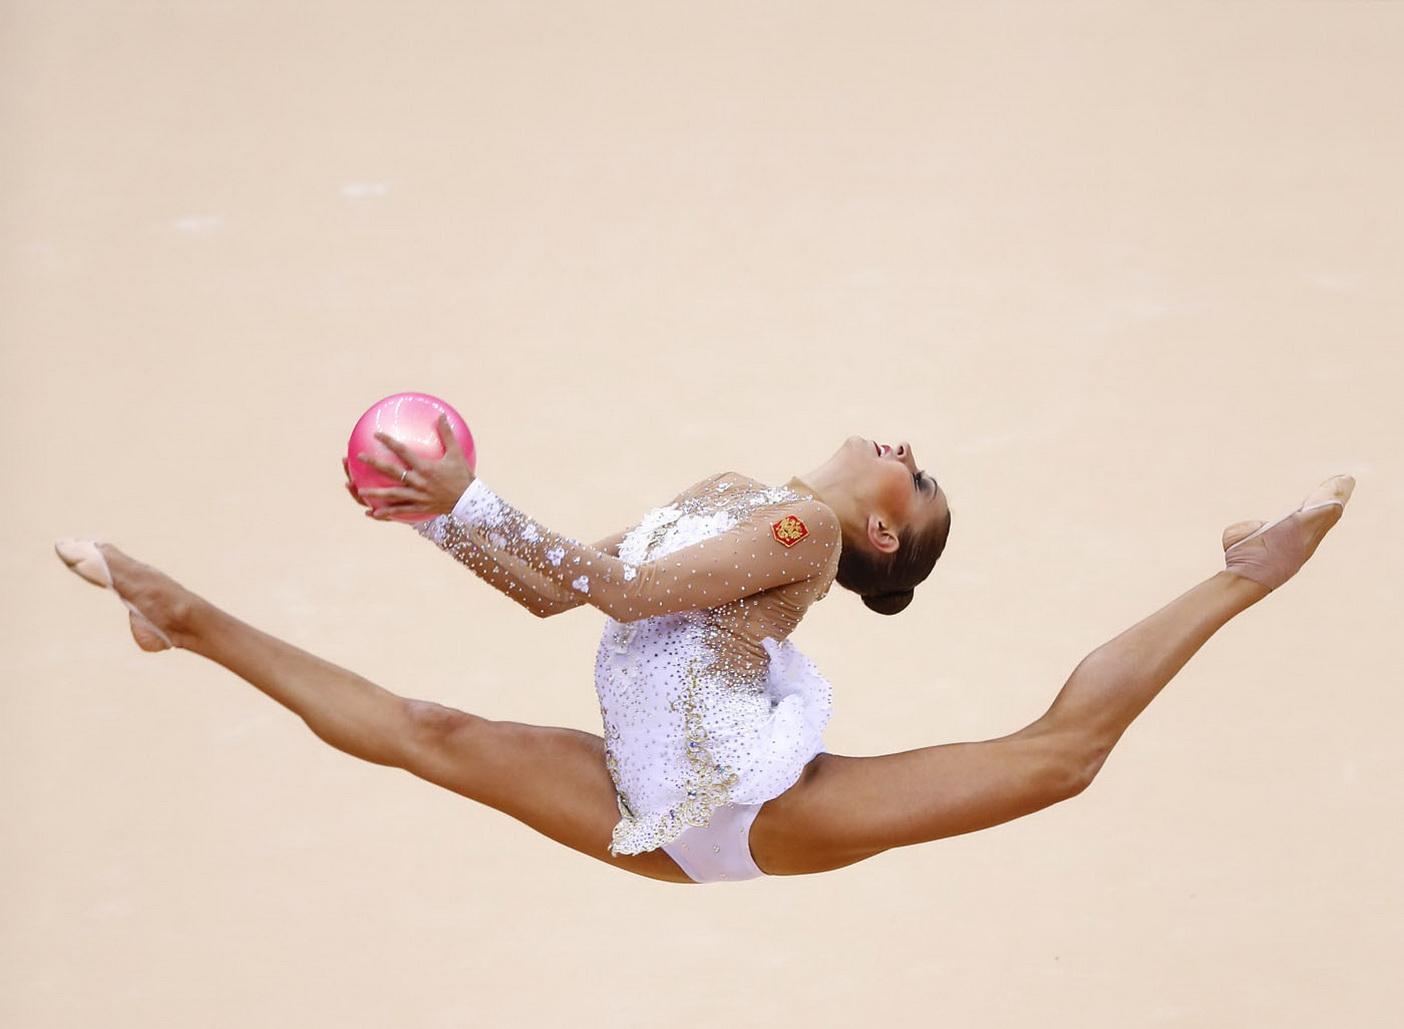 Фото попки олимпийских гимнасток фото 151-561